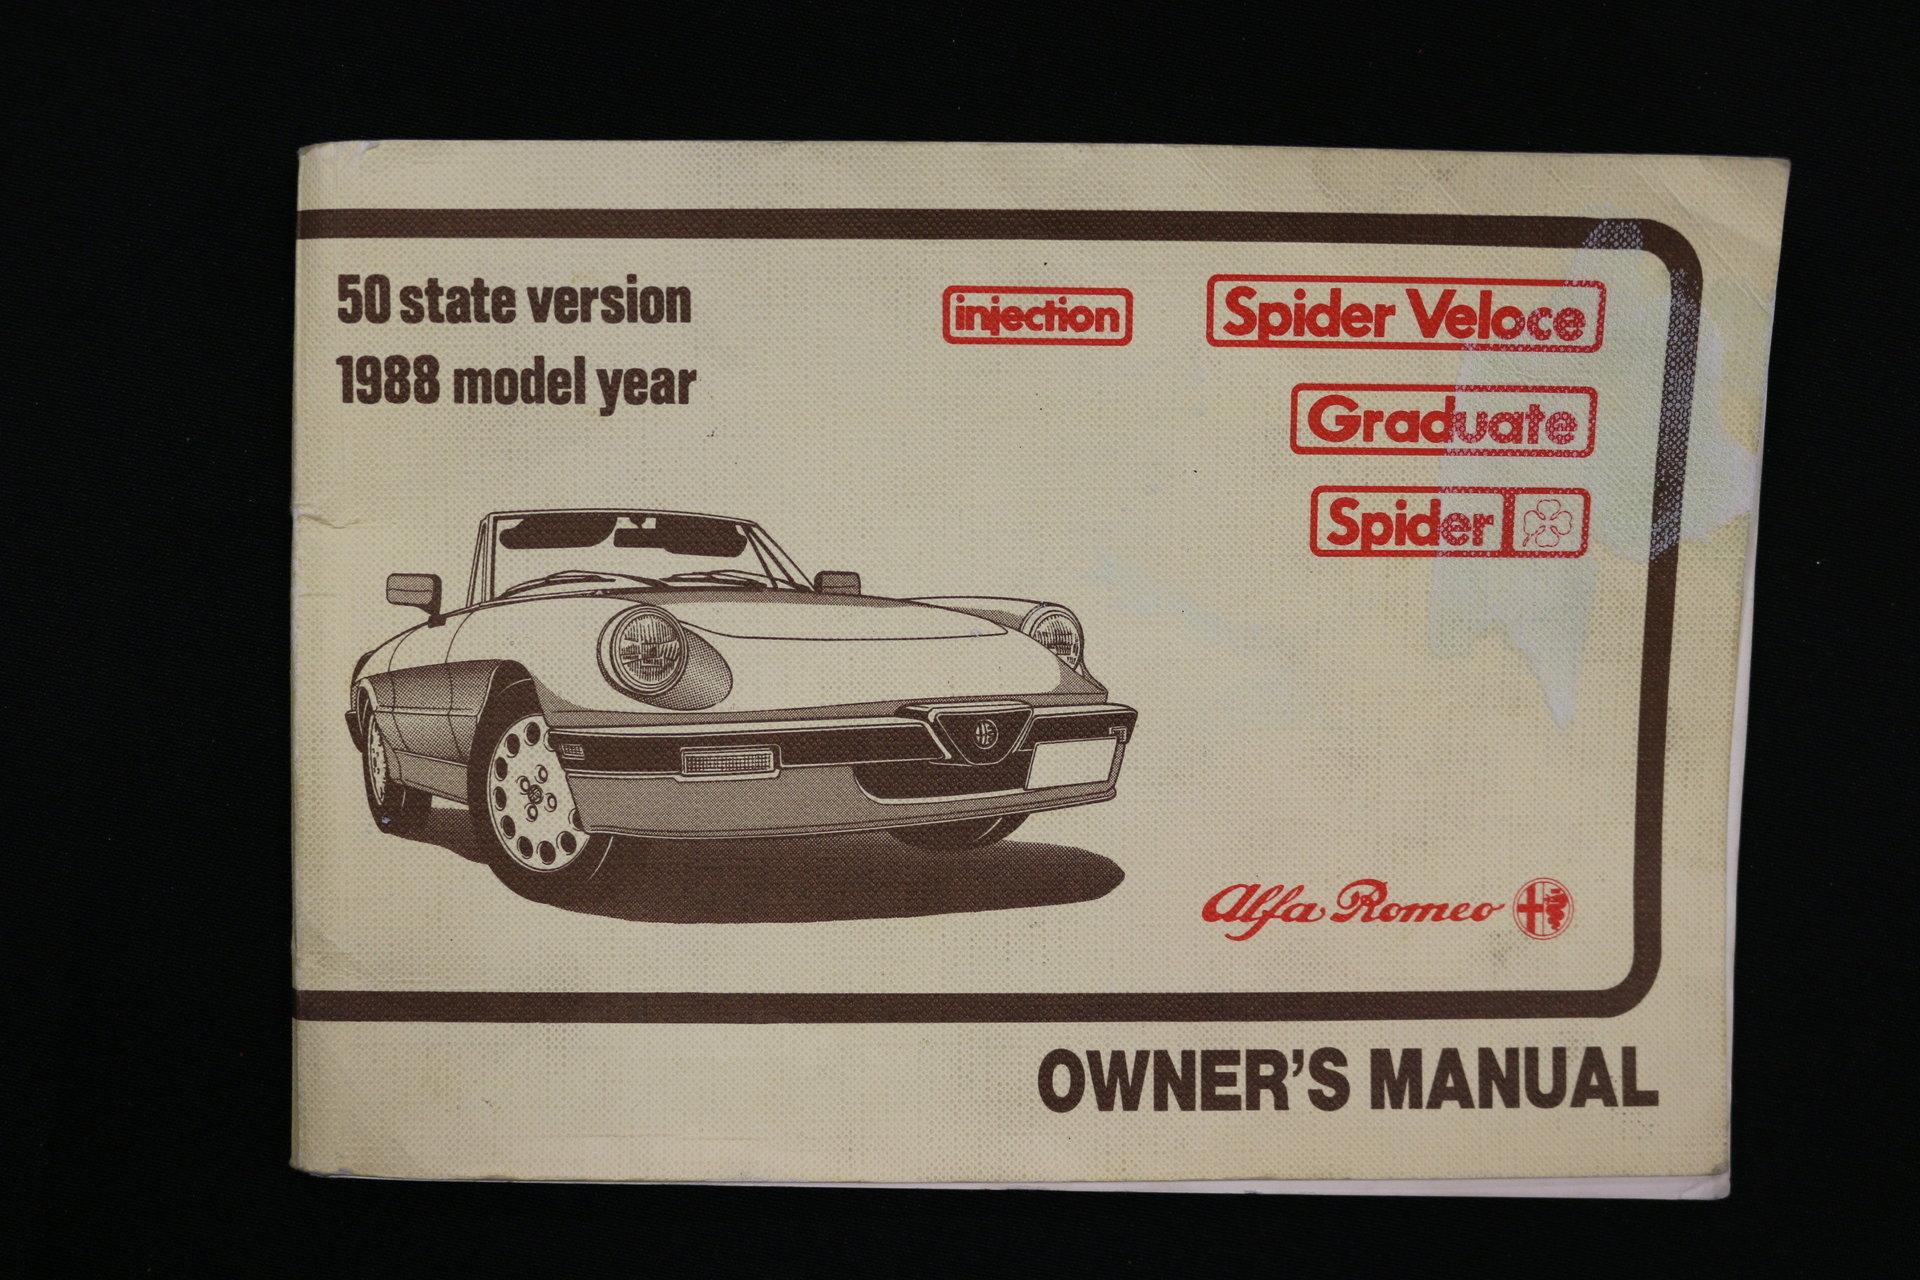 alfa romeo gtv workshop manual ebook rh alfa romeo gtv workshop manual ebook esoulk de Alfa Romeo 159 Alfa Romeo 147 JTD